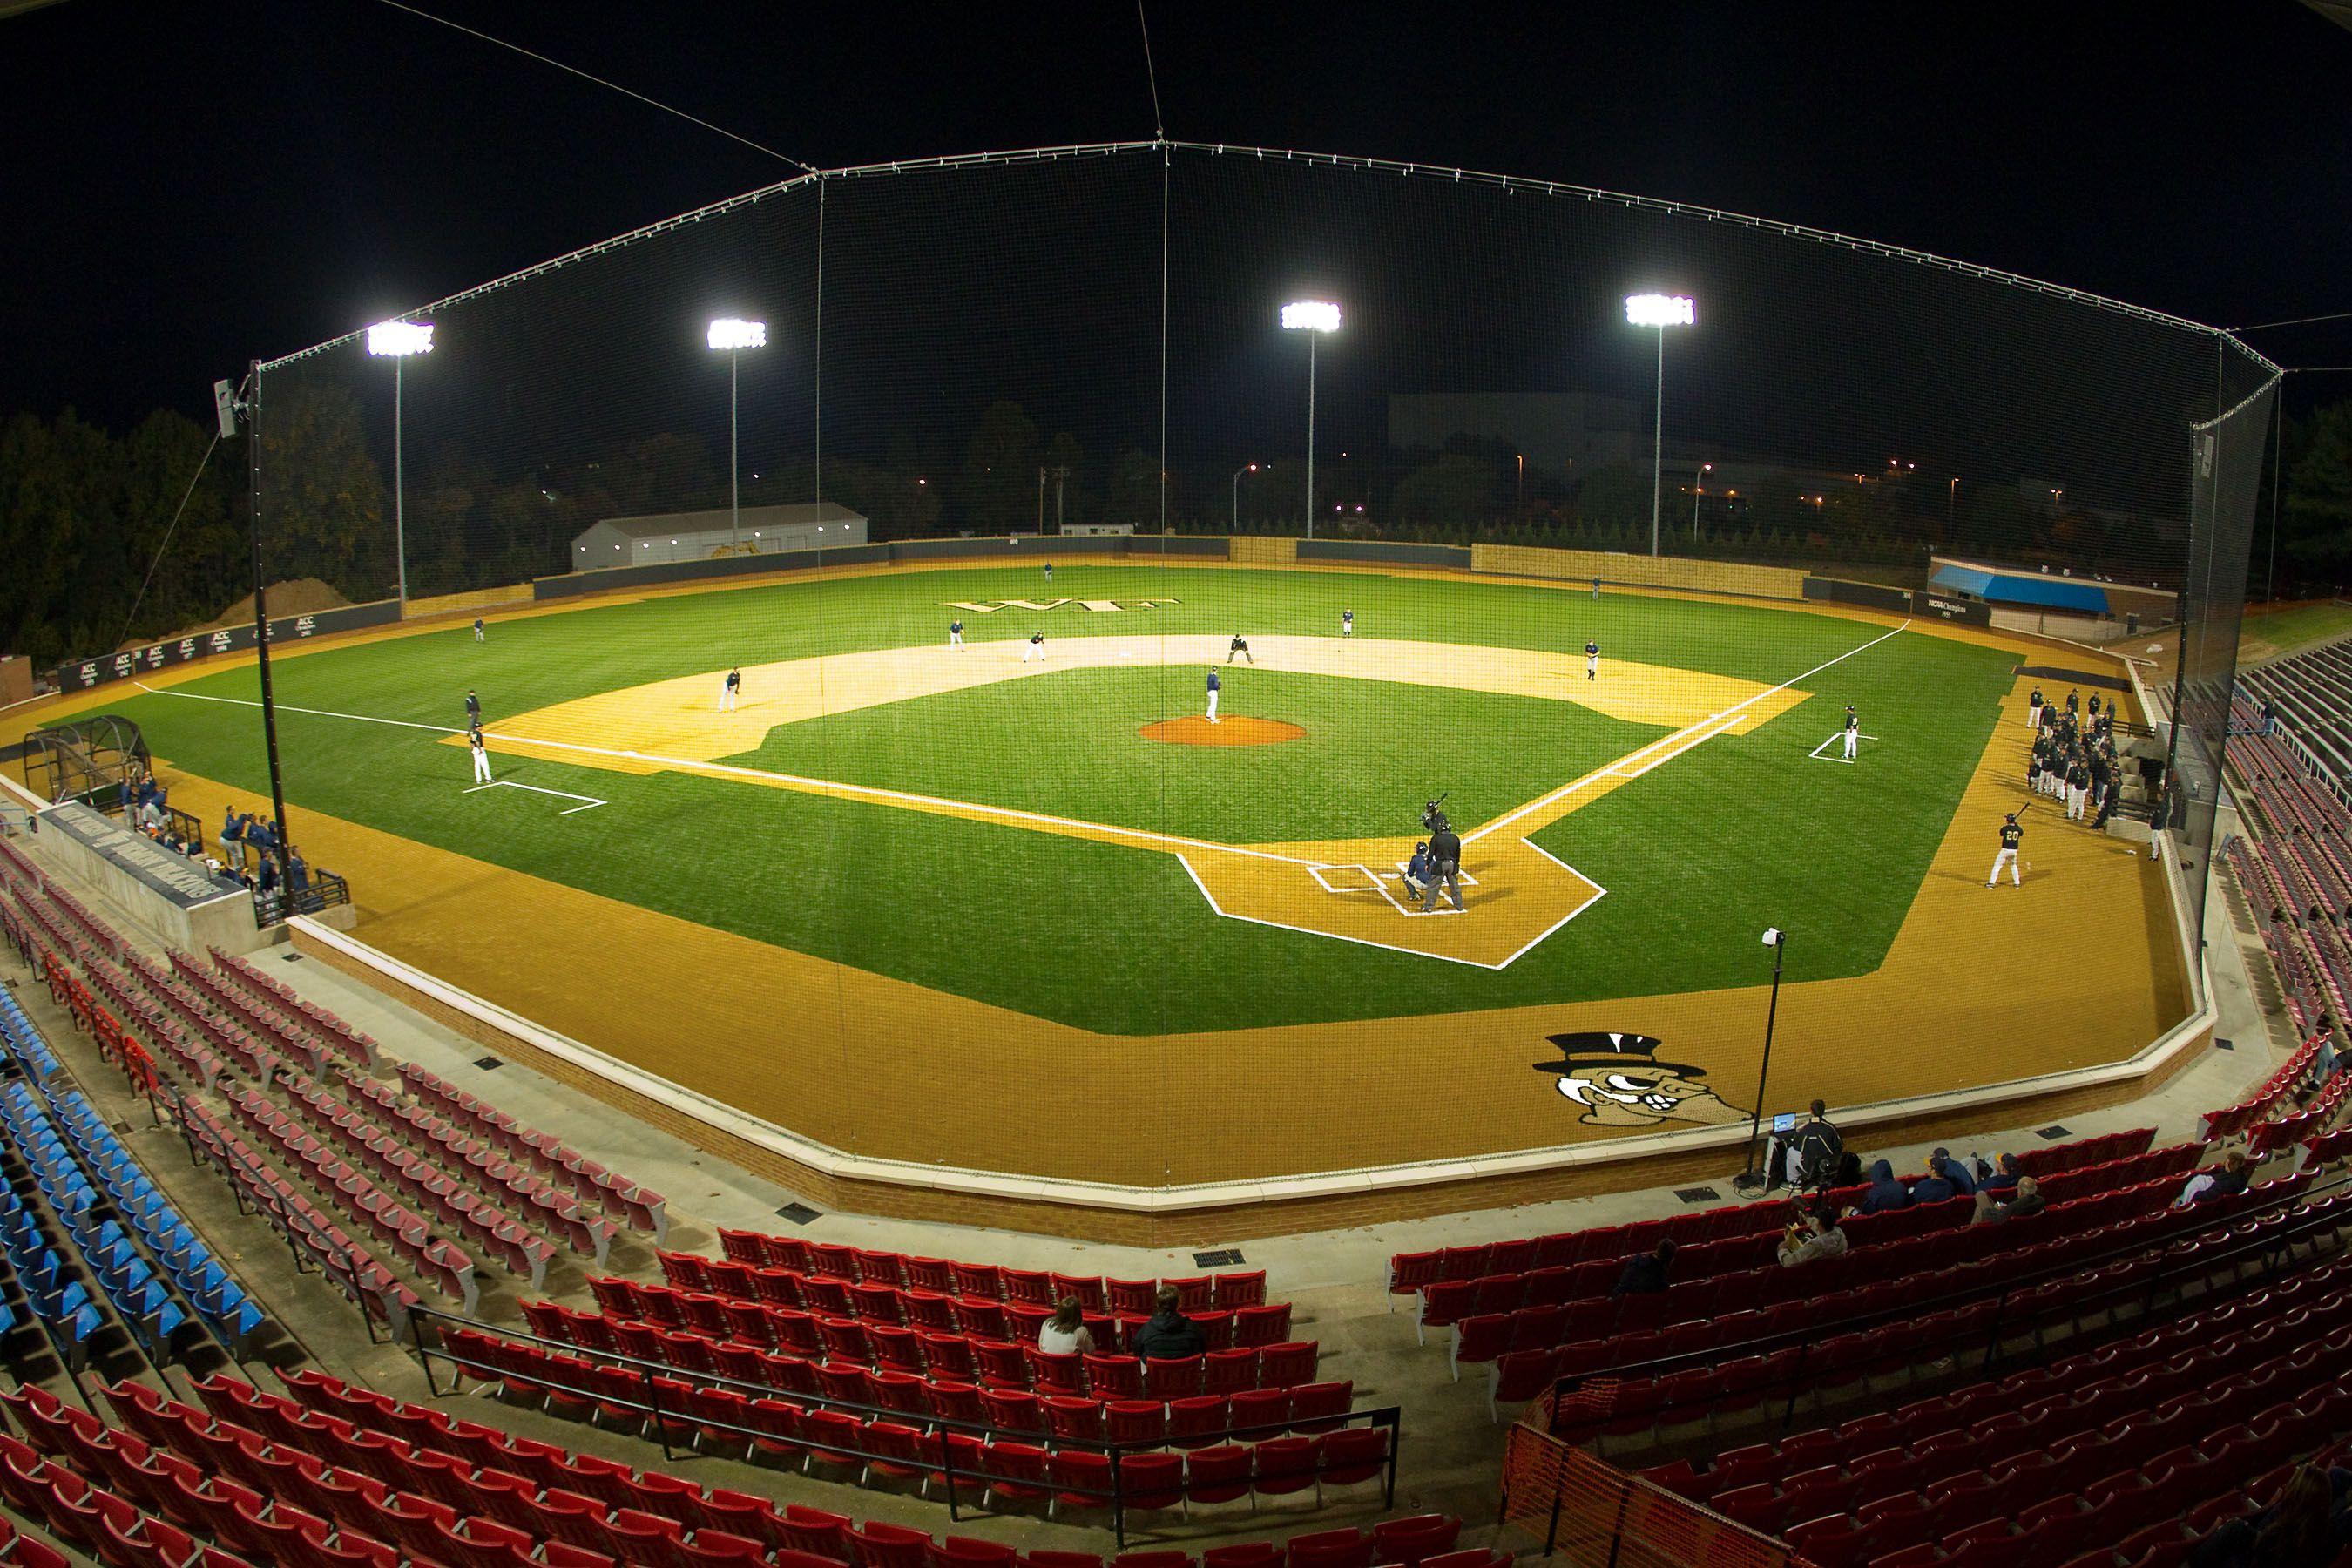 Wake Forest University Gene Hooks Field 127 925 Square Feet Of Astroturf Gameday Grass 3d60h Installed In Astro Turf Wake Forest University Baseball Field